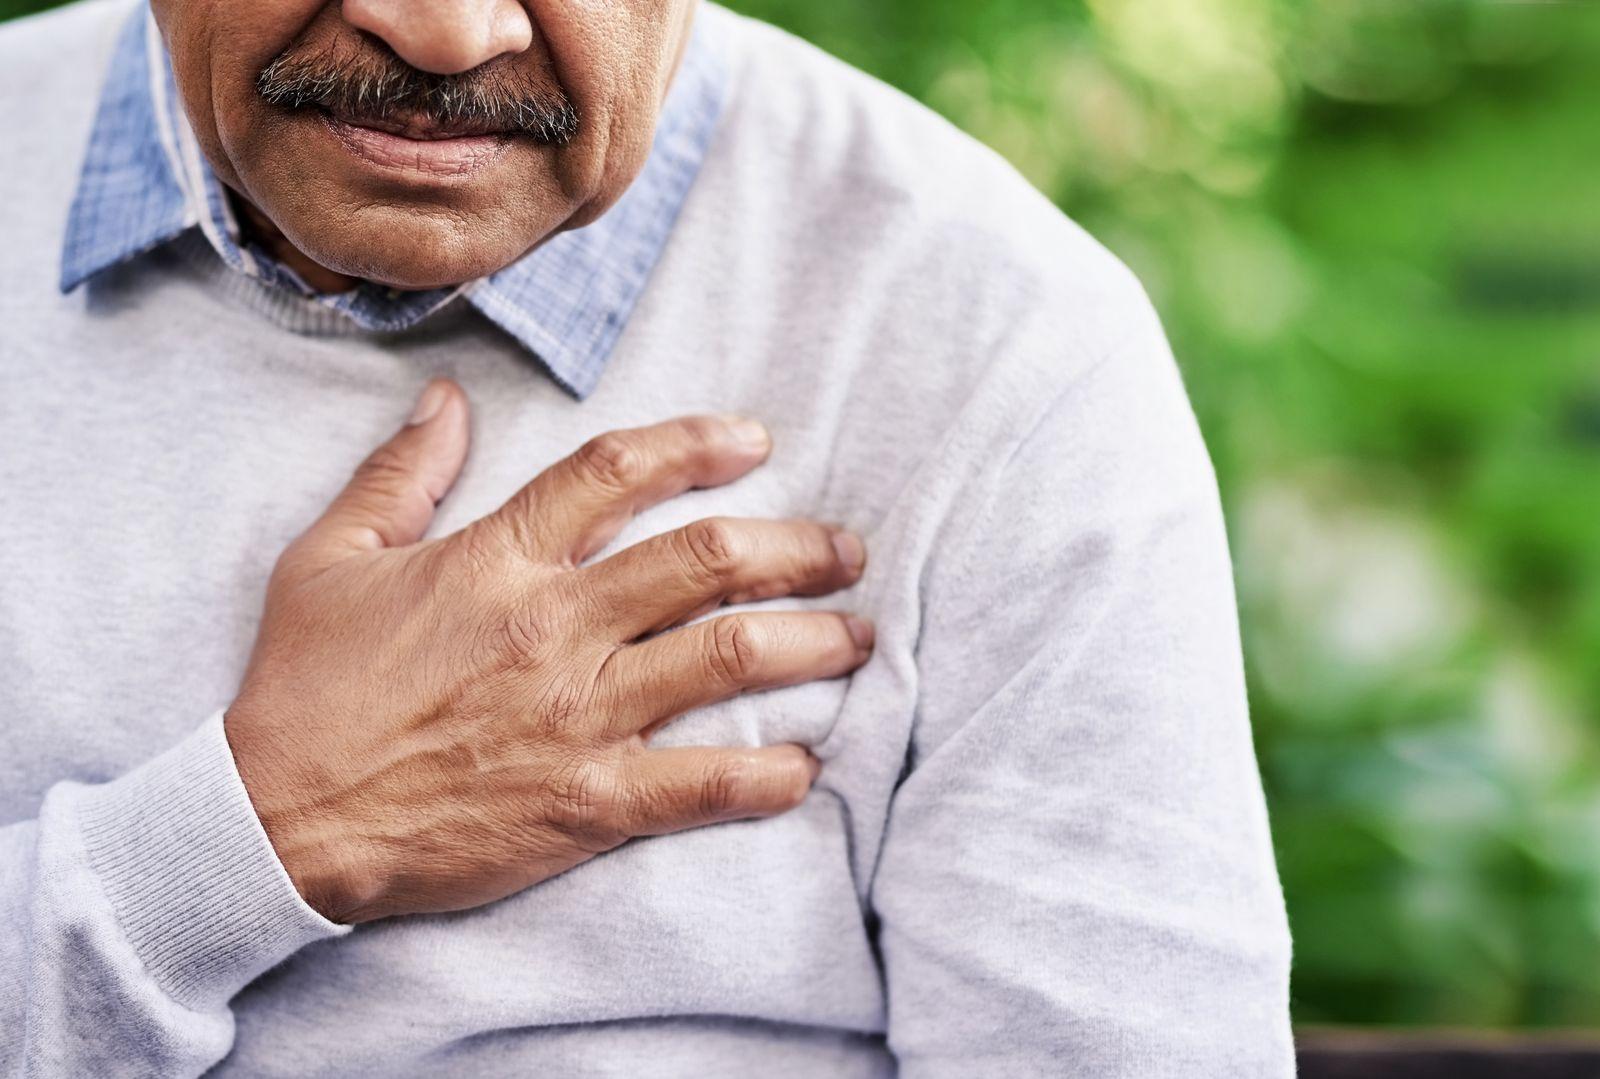 AUFMACHER EINMALIGE VERWENDUNG Chest pain can have a variety of causes EXPIREN AM 18.10.2024